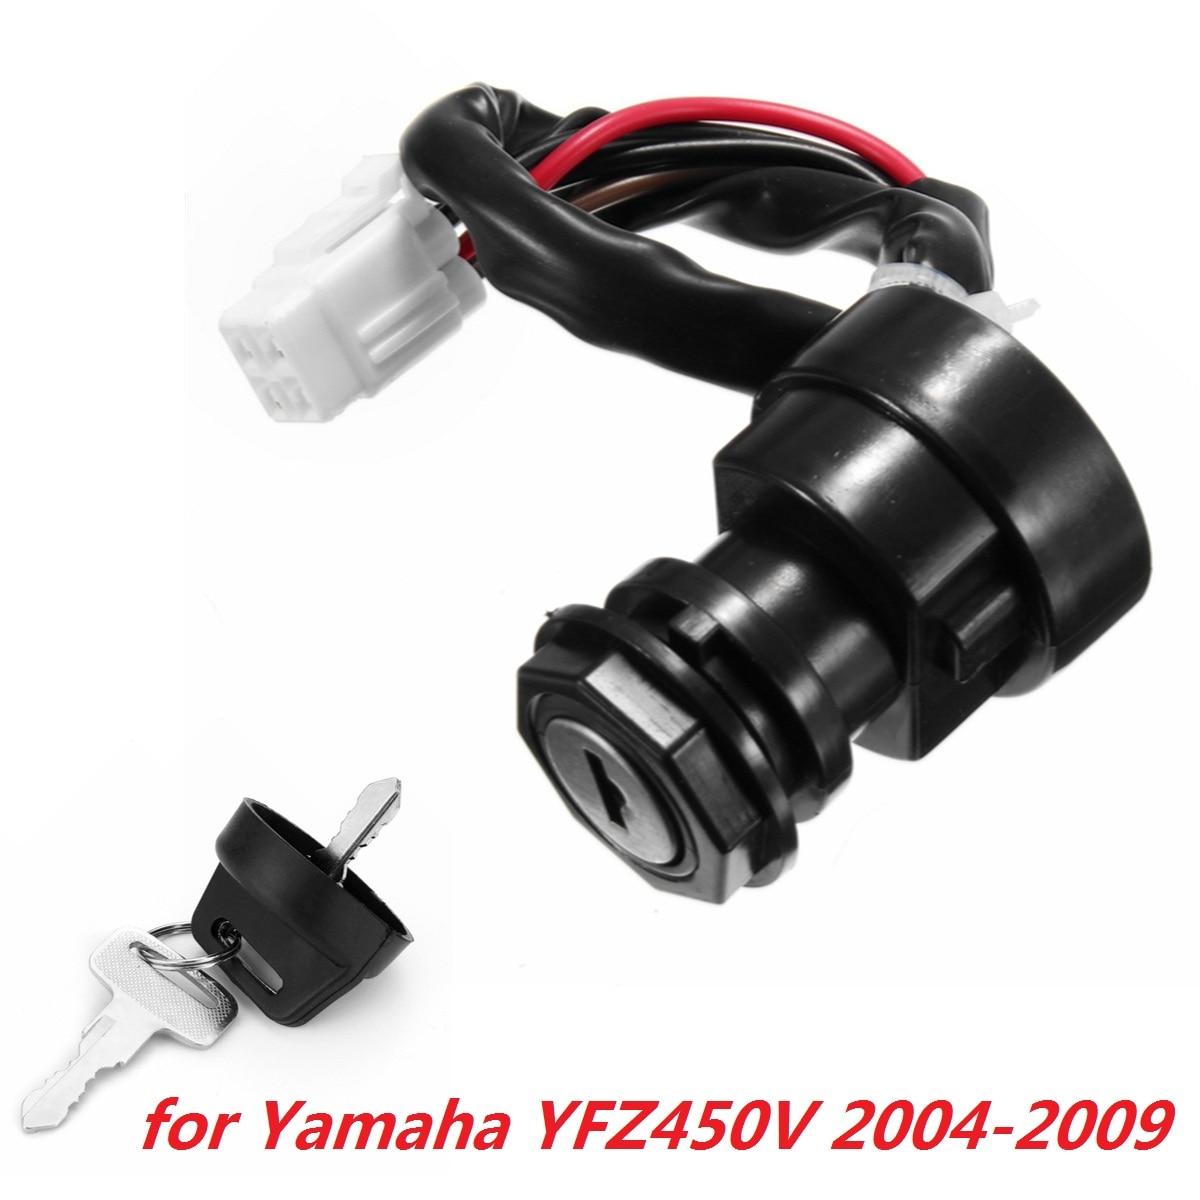 Black Motorcycle Ignition 2 Keys Lock Swicth Set  For YAMAHA YFZ450V 2004 2005 2006 2007 2008 2009 ATV